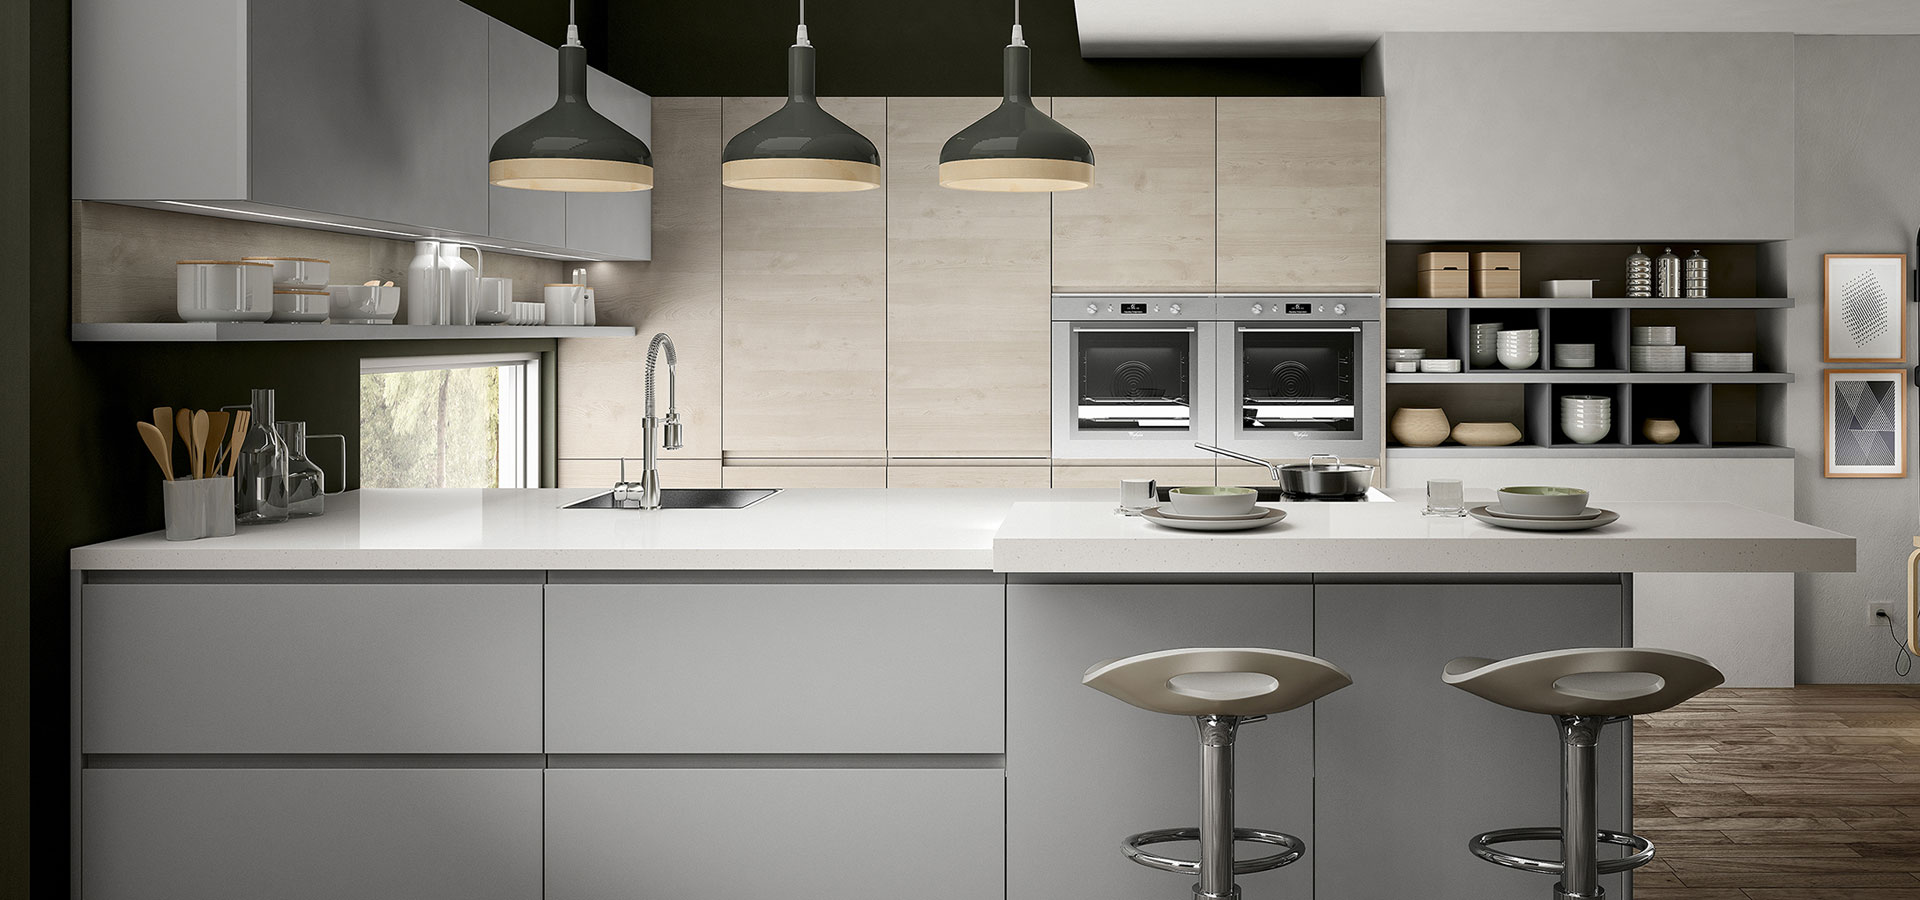 Cucine moderne arredo3 i 5 modelli da non perdere blog - Cucina senza maniglie ...